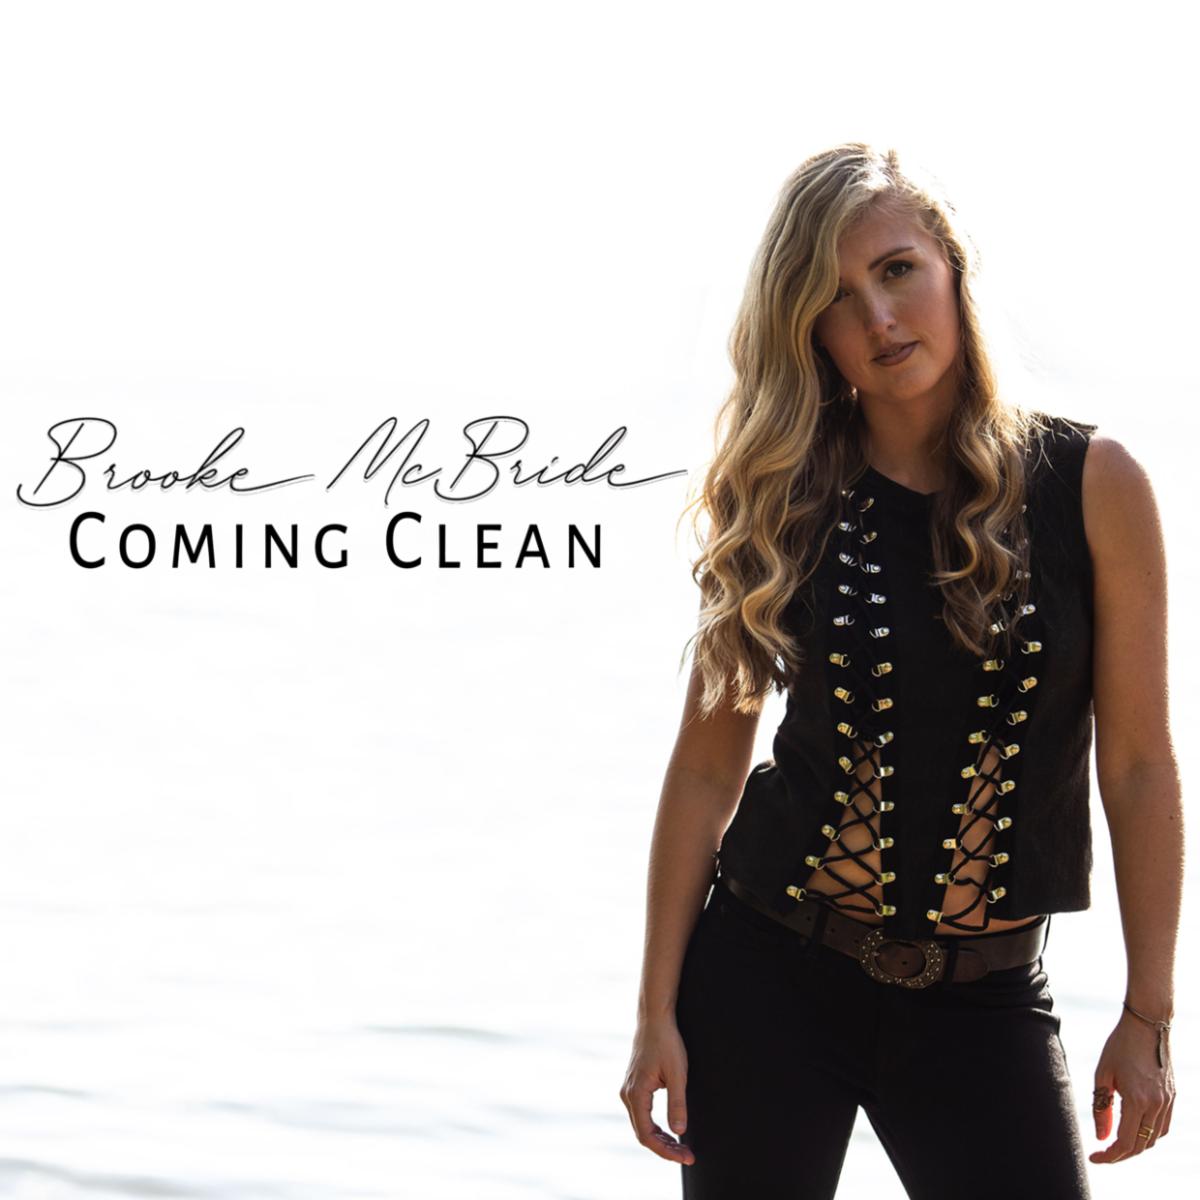 Brooke McBride